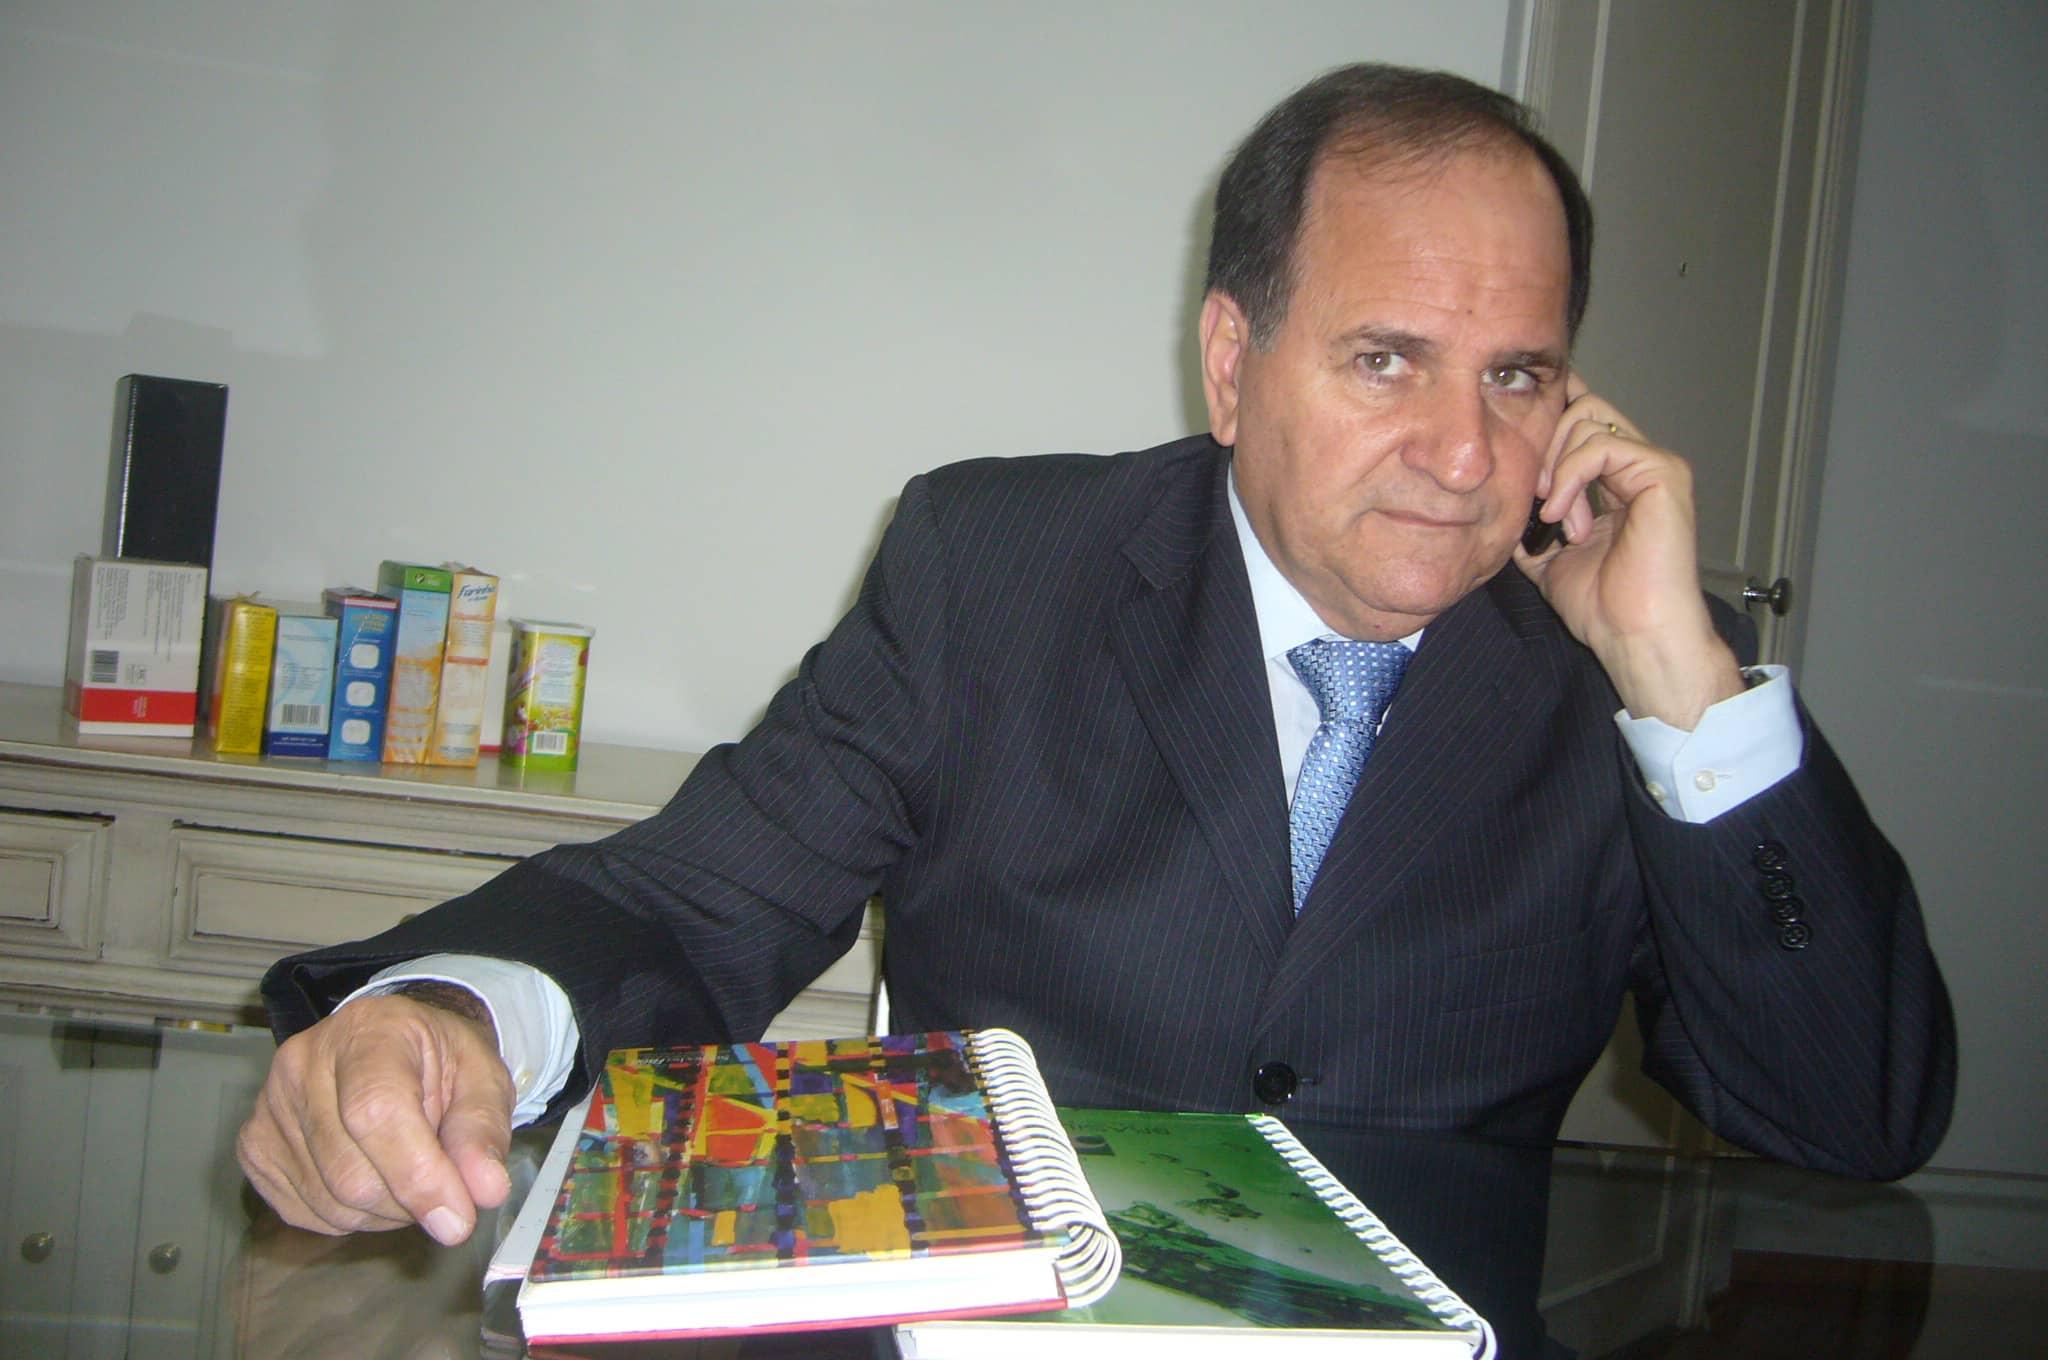 Raul-Capozzi